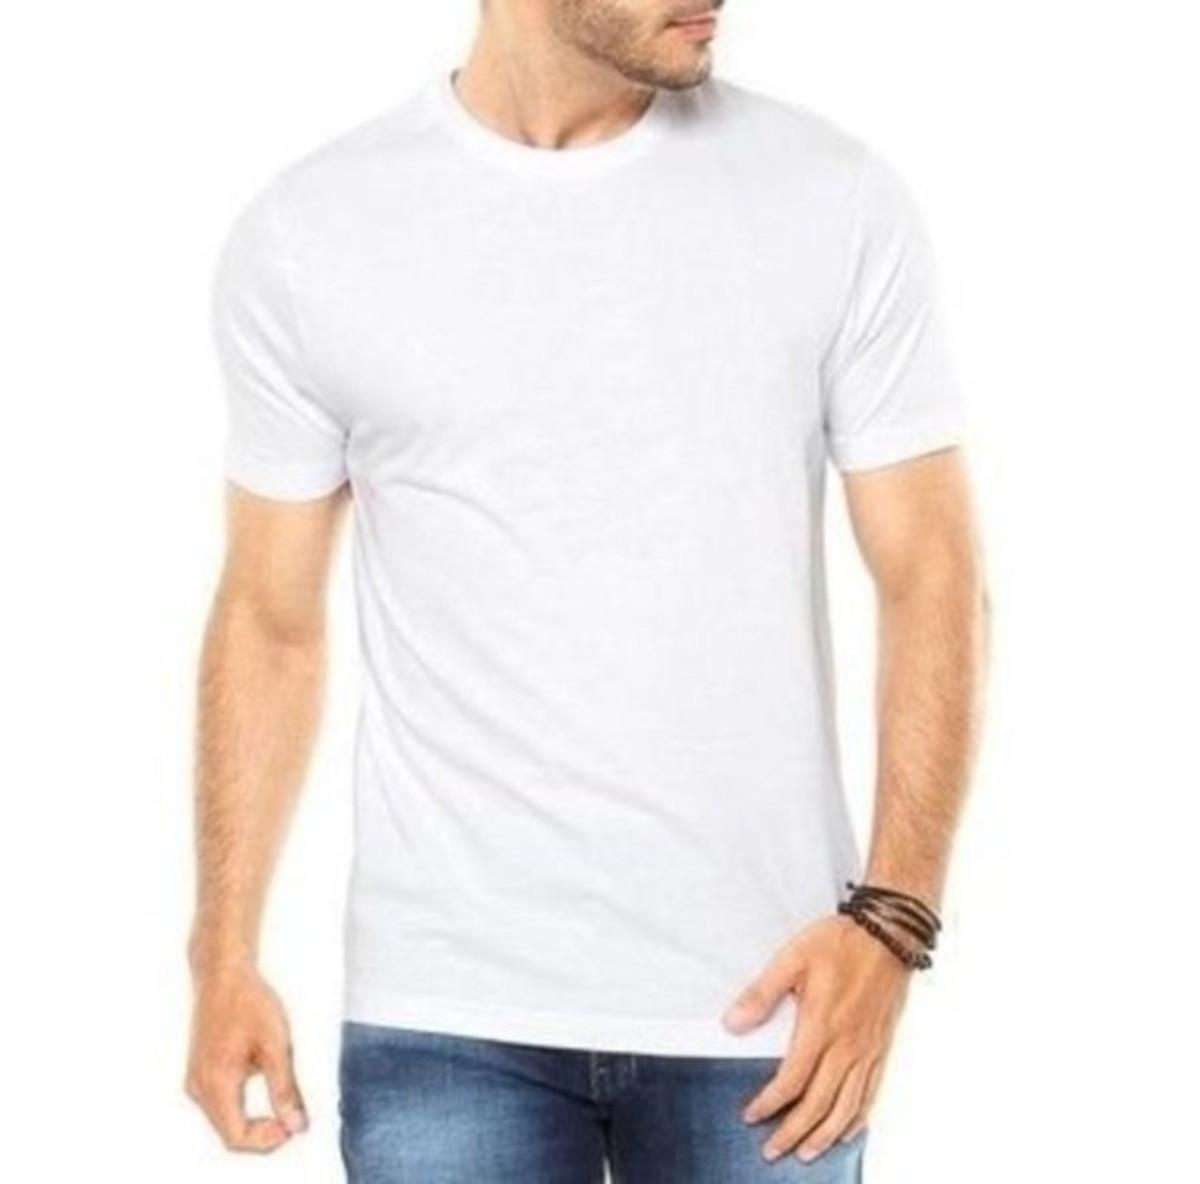 60d0e892f Camiseta Masculina Lisa Básica Camisa Blusa Manga Curta no Elo7 ...